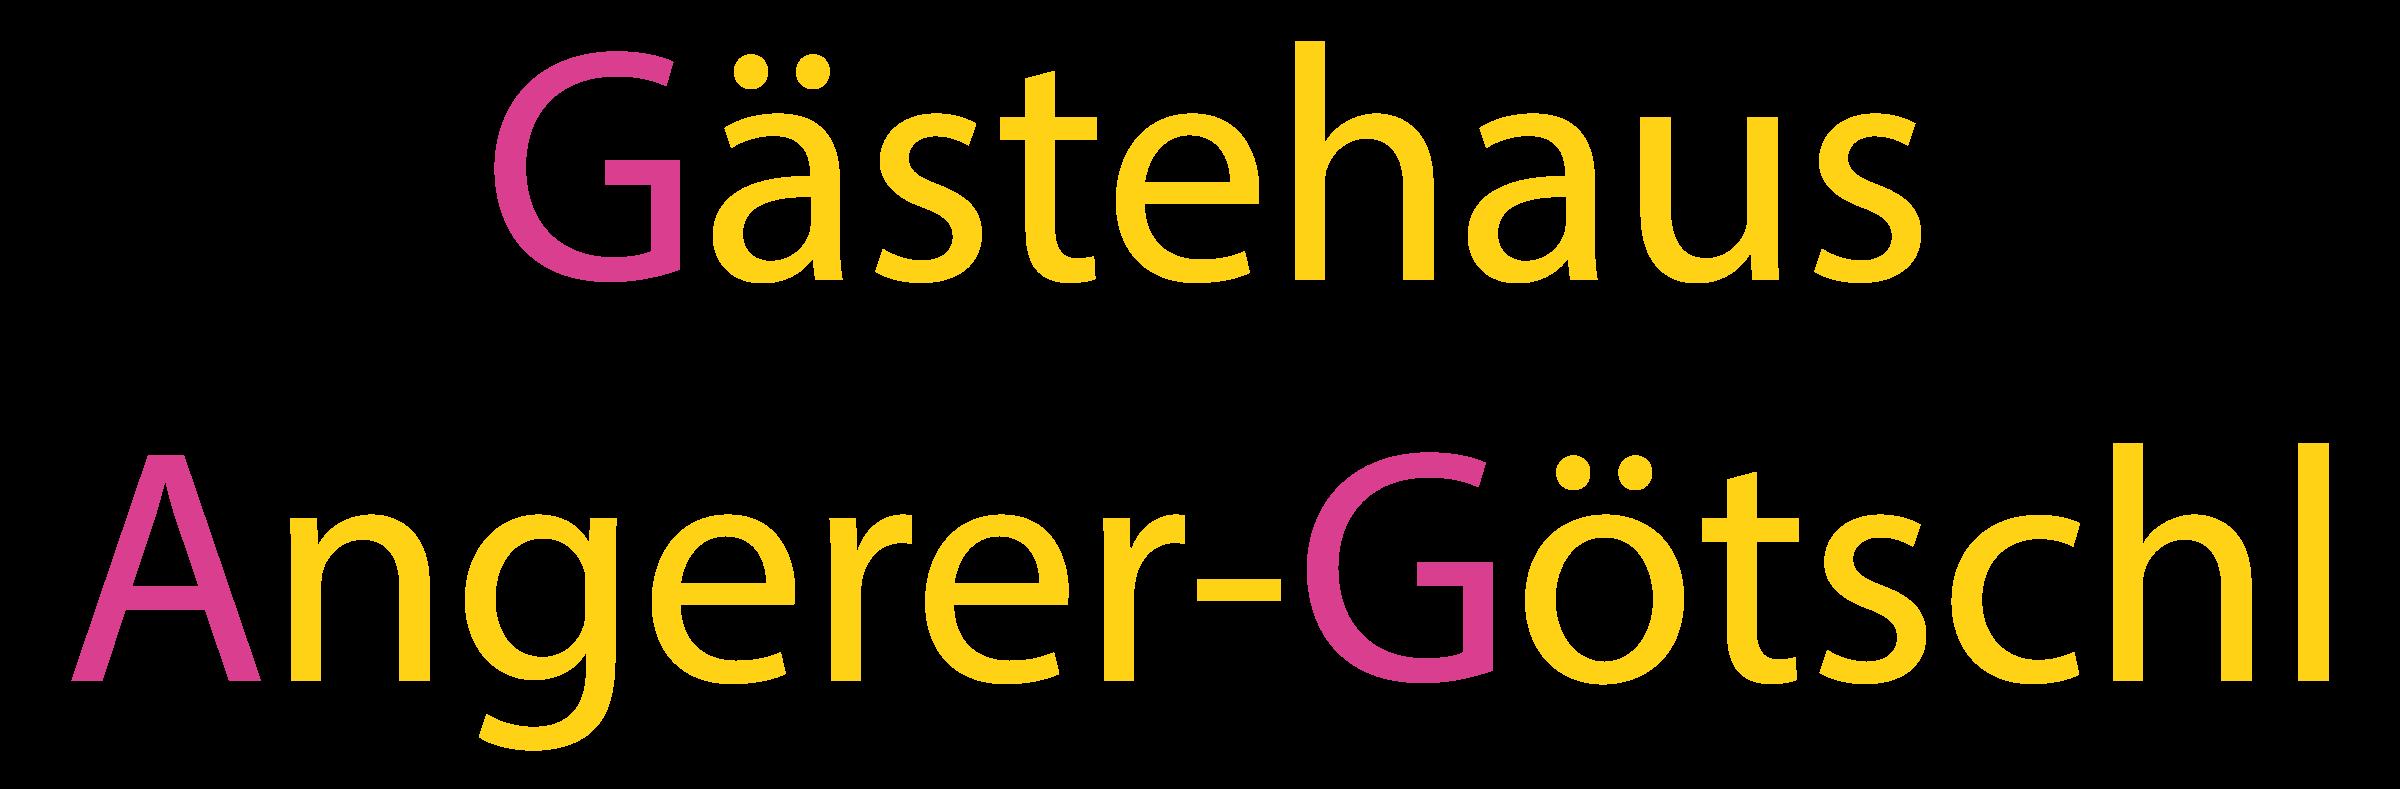 Logo Gästehaus Angerer-Götschl